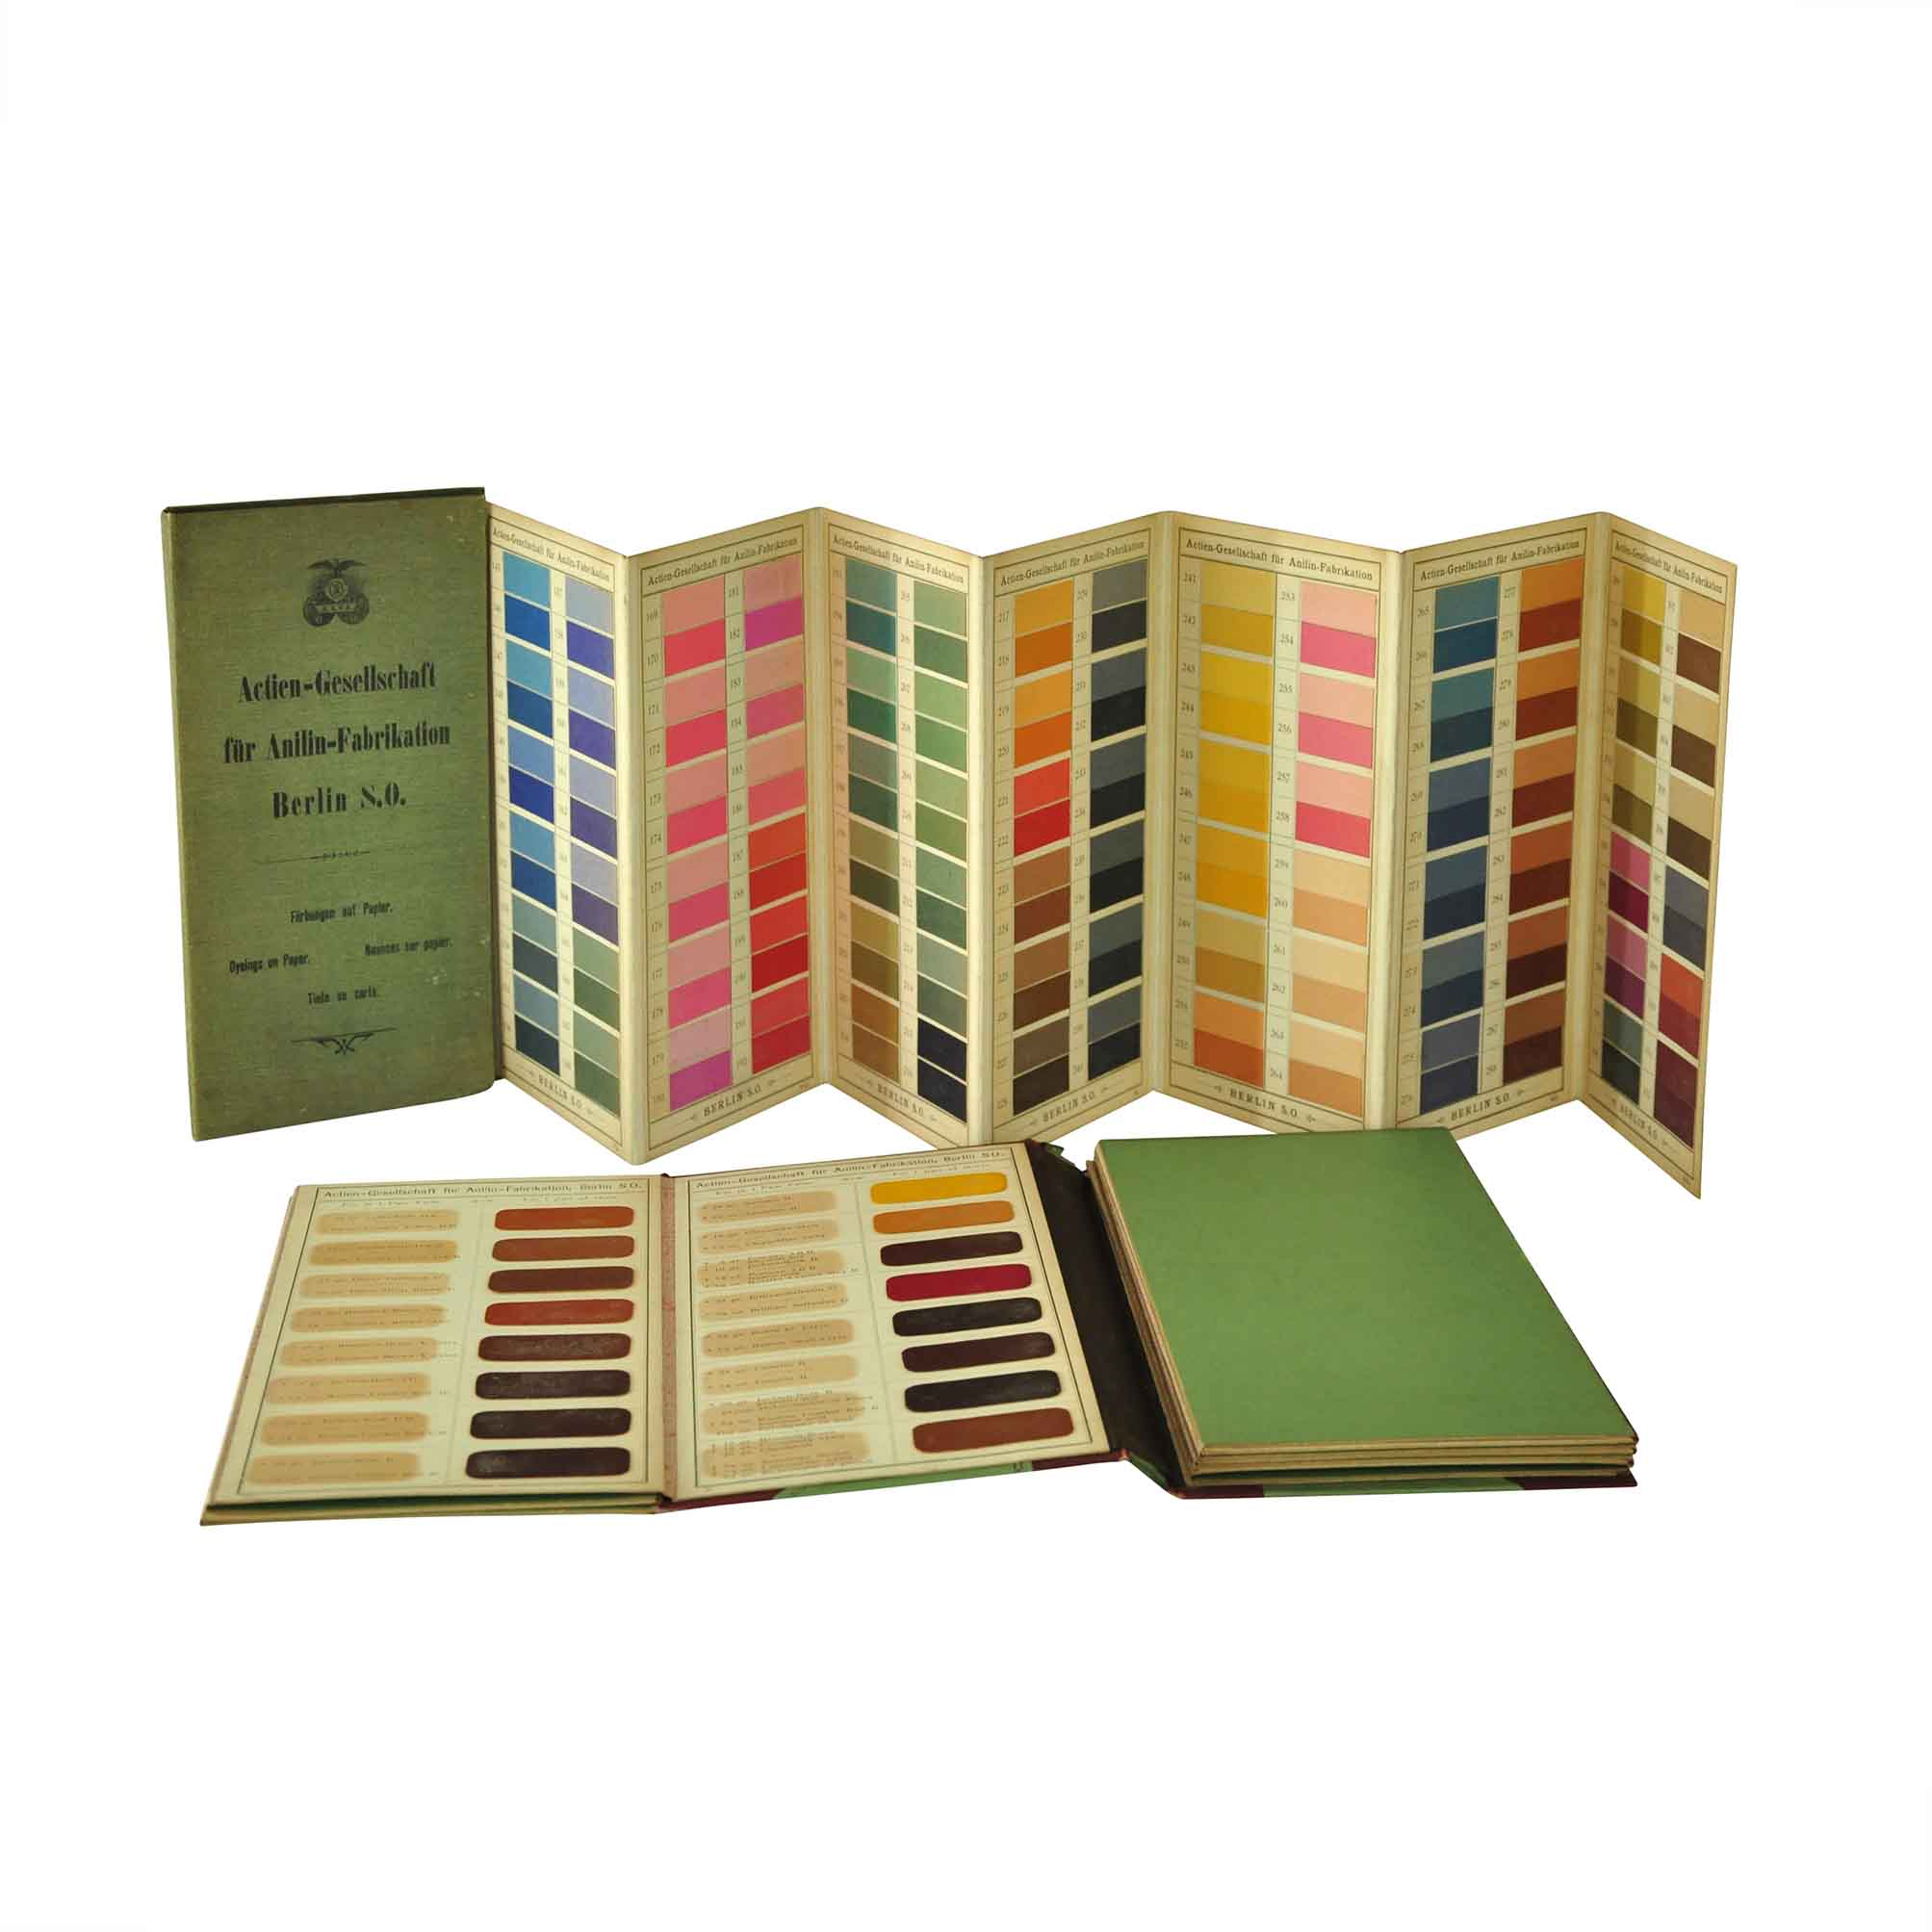 5562-Agfa-Dyeings-Leather-Paper-1900-Leporelli-1-free-N.jpg